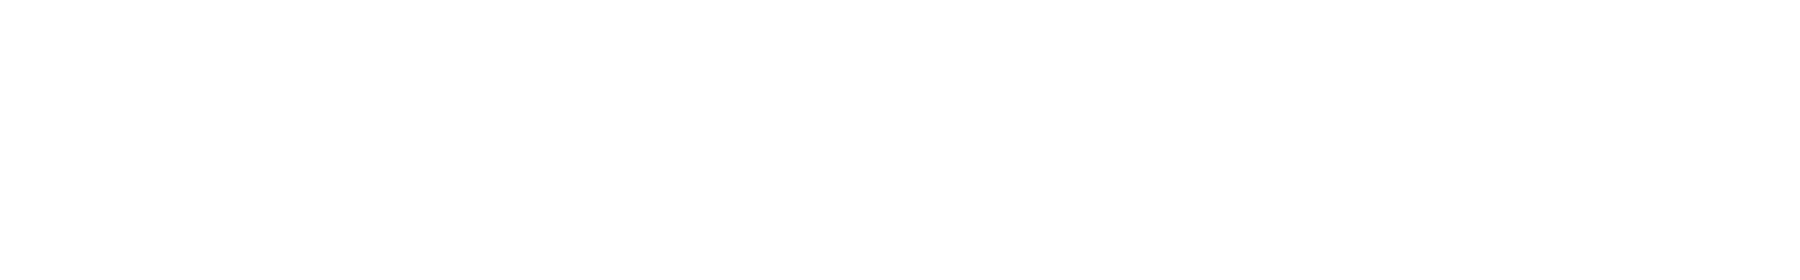 g abs05 008